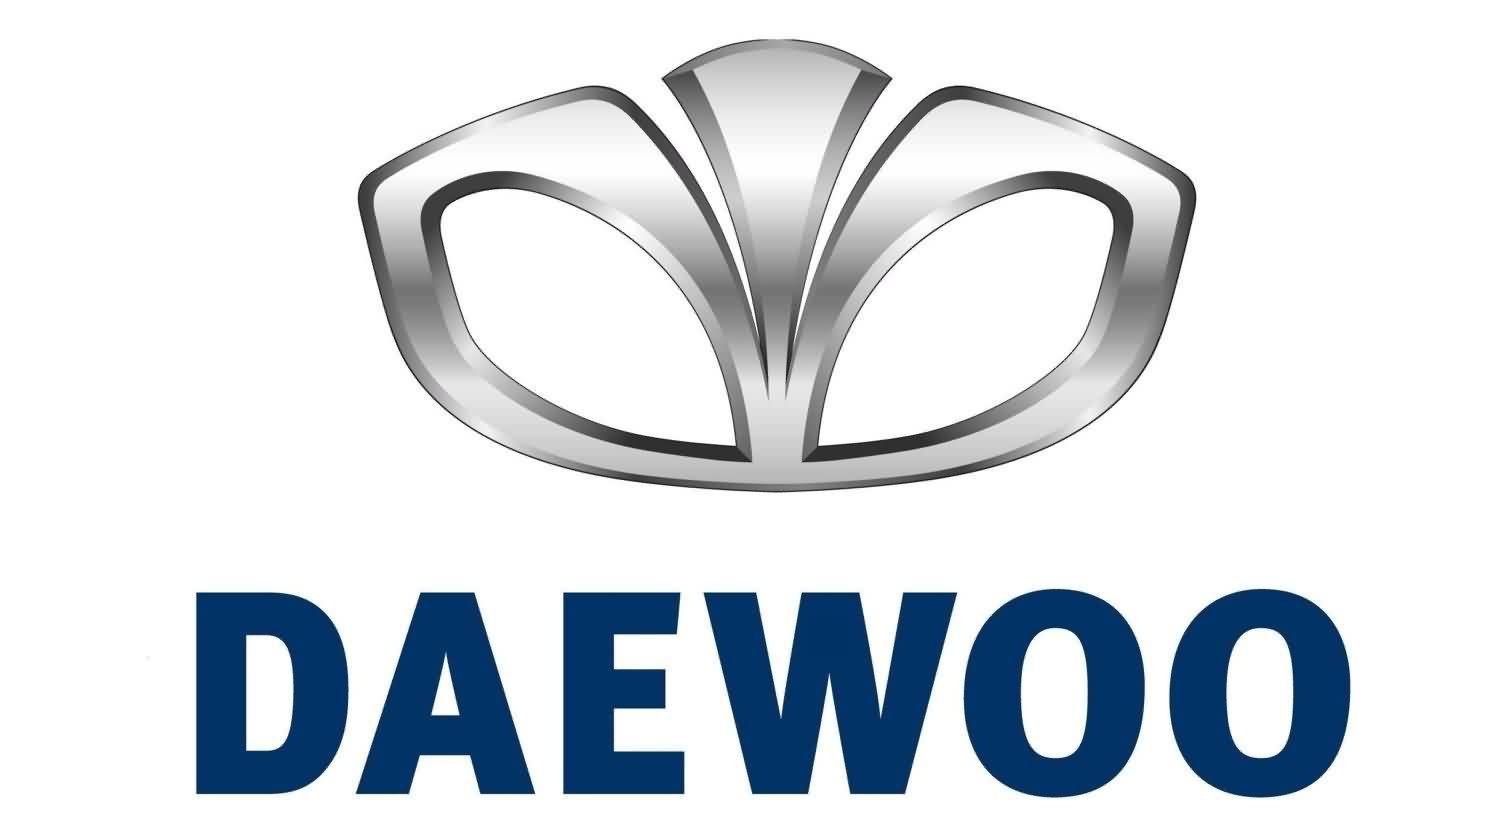 Daewoo Logo Car Logos Car Emblem Daewoo